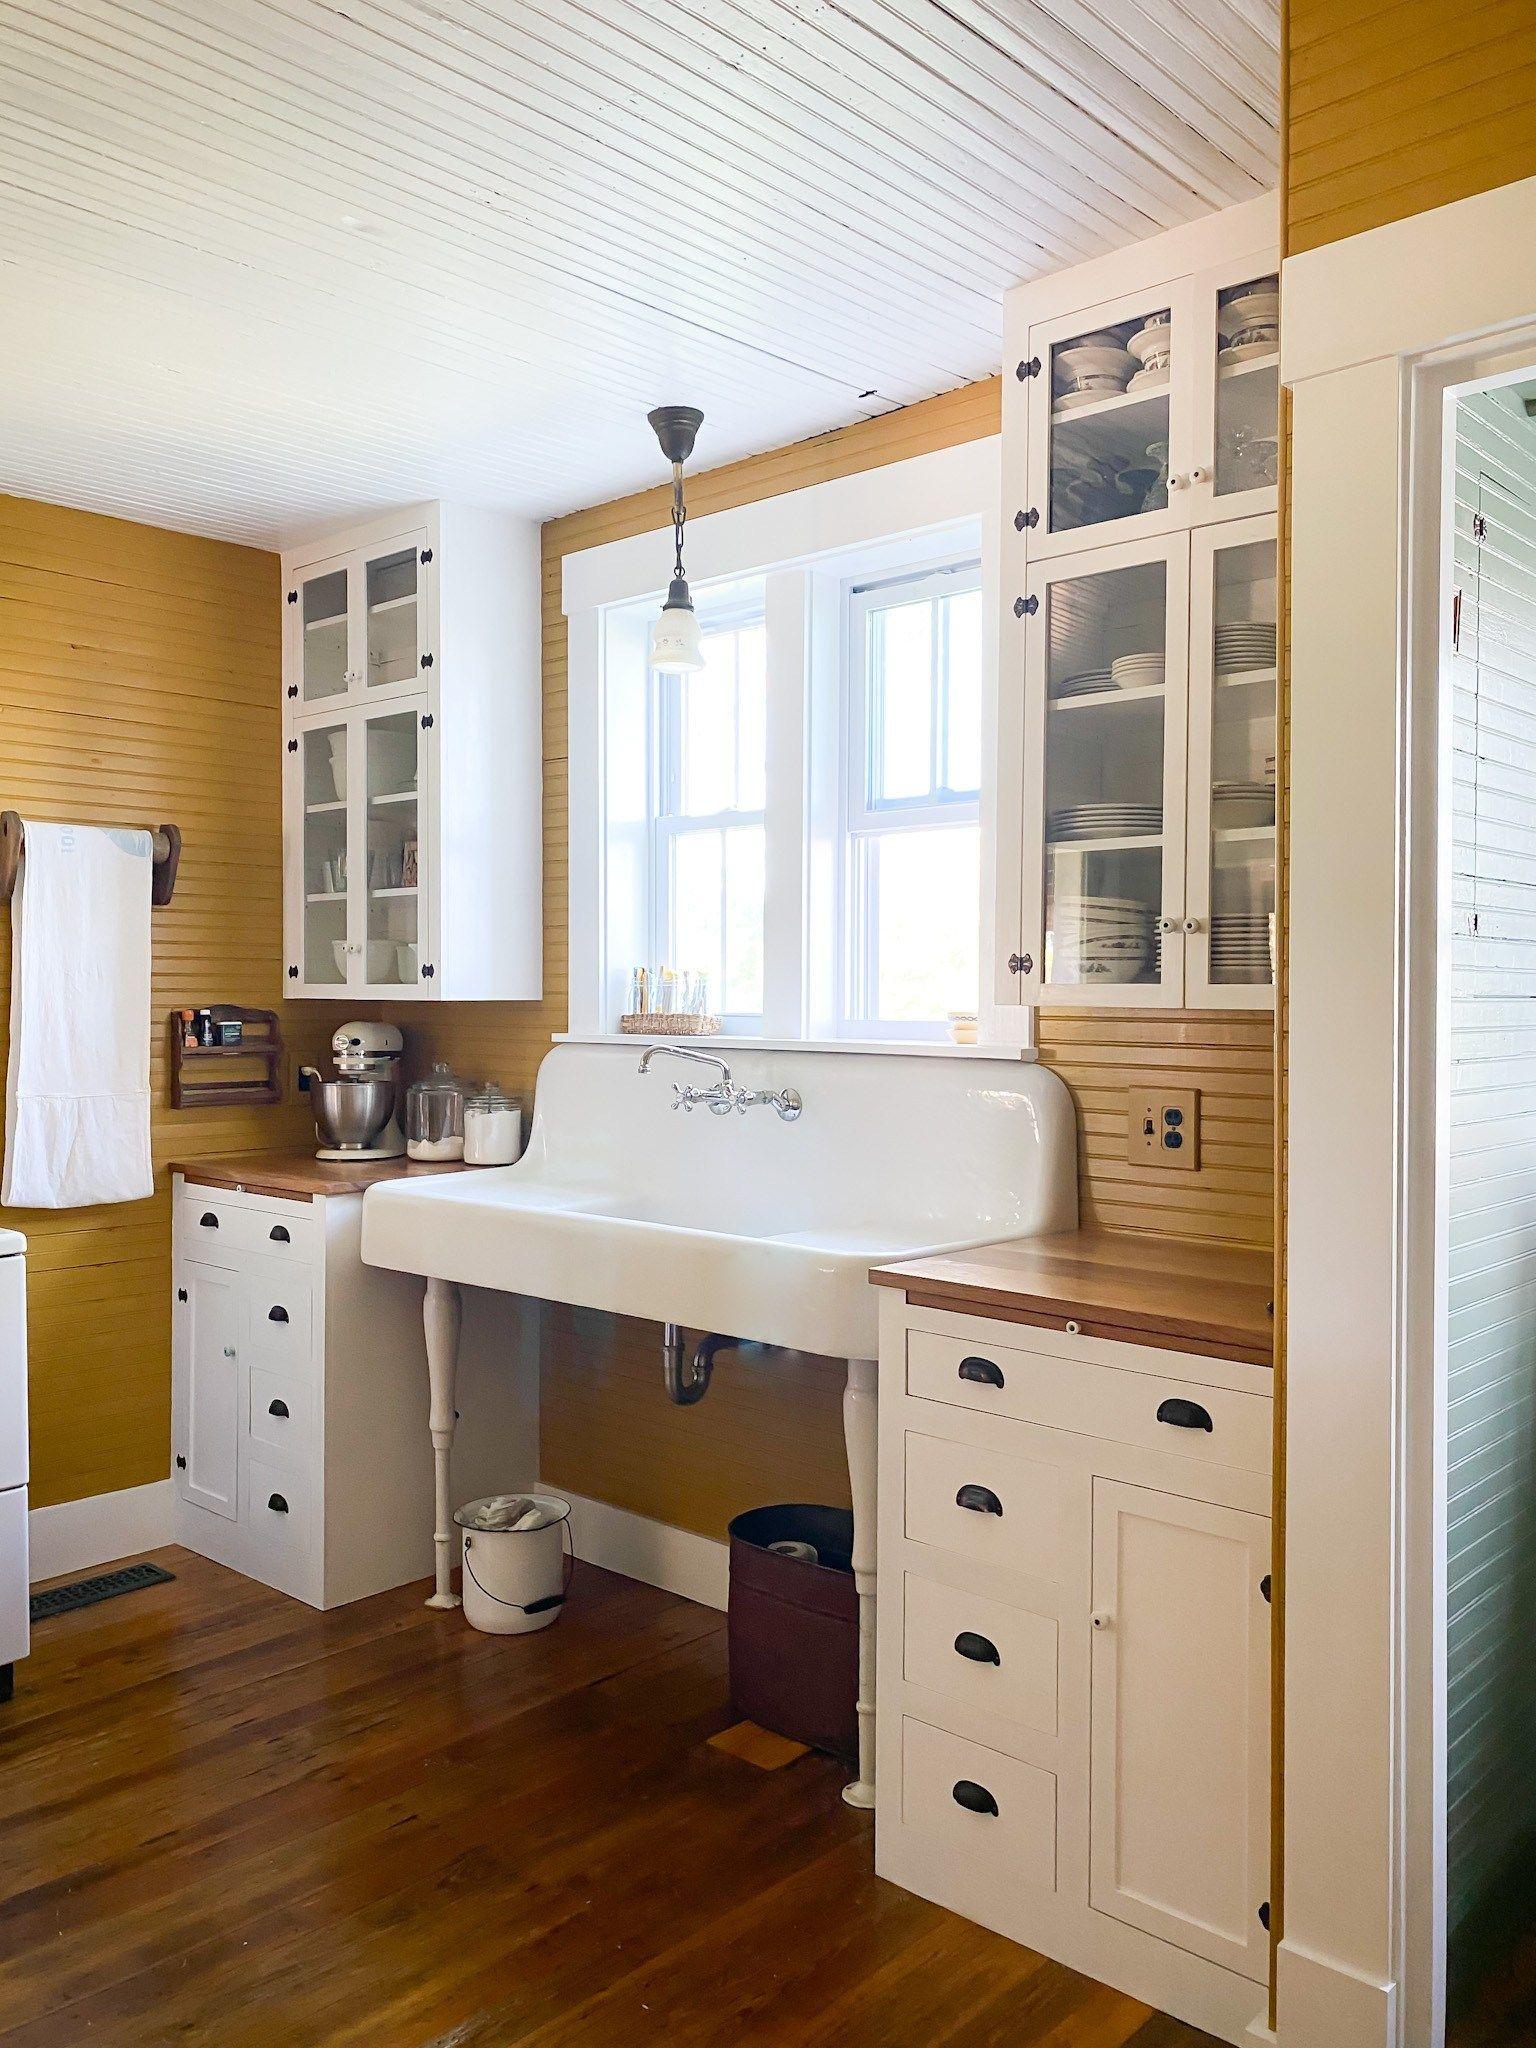 Historic Kitchen Cabinets - Farmhouse Vernacular blog